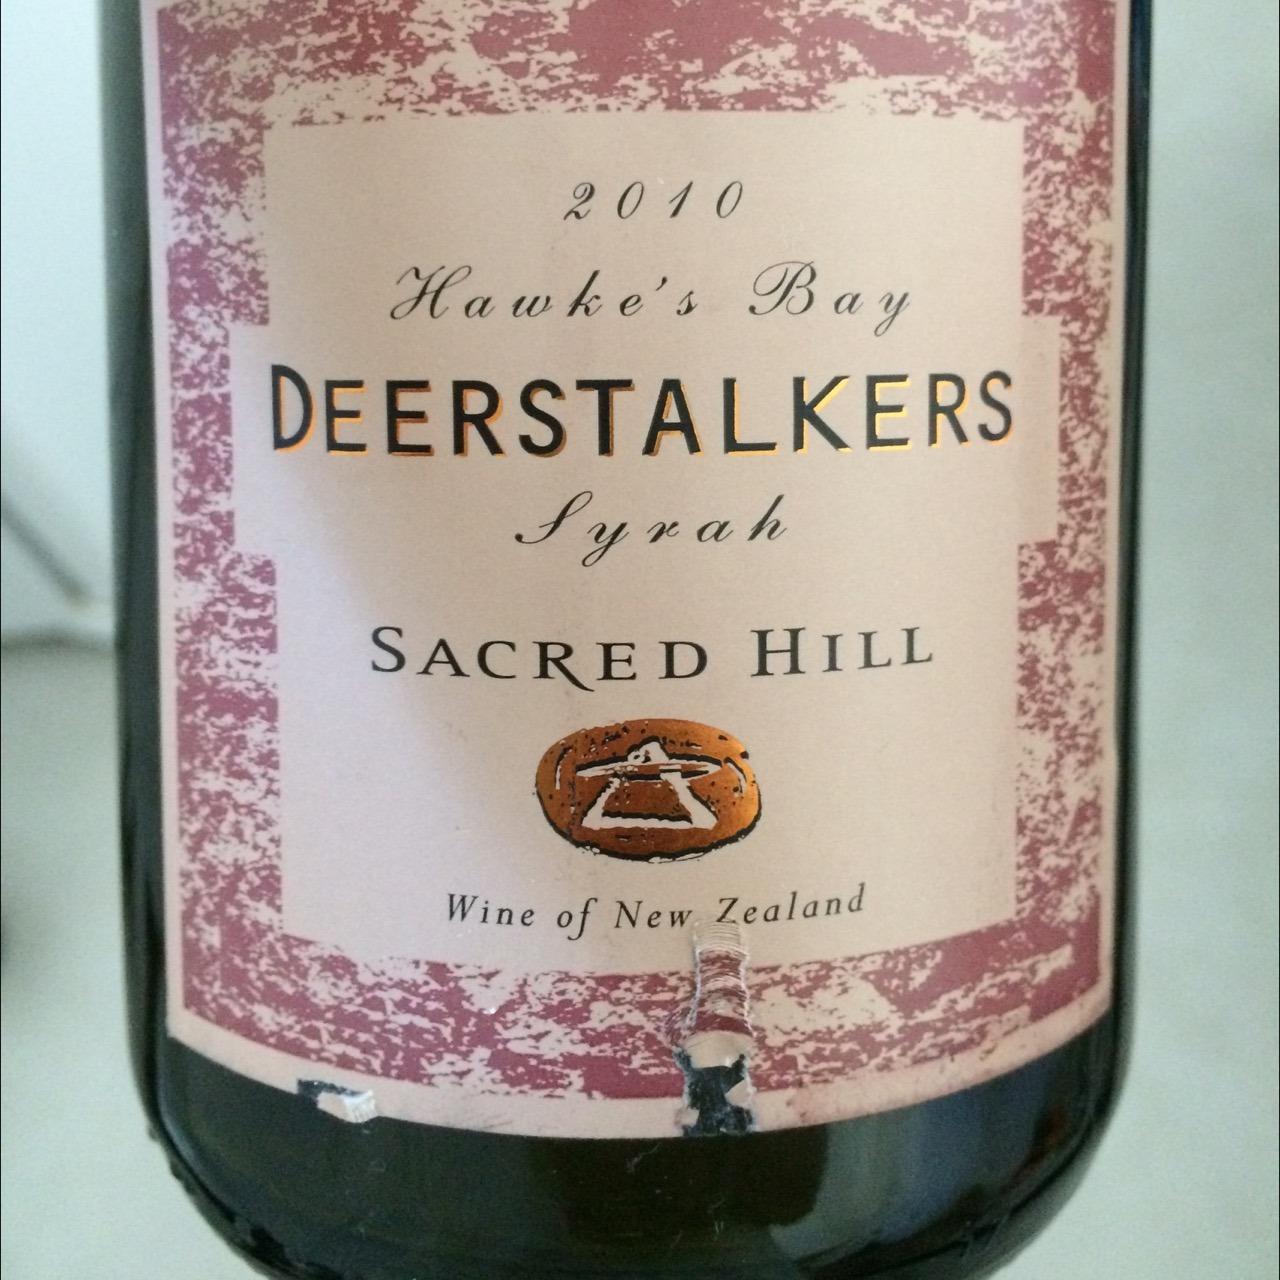 Sacred Hill Deerstalkers Syrah